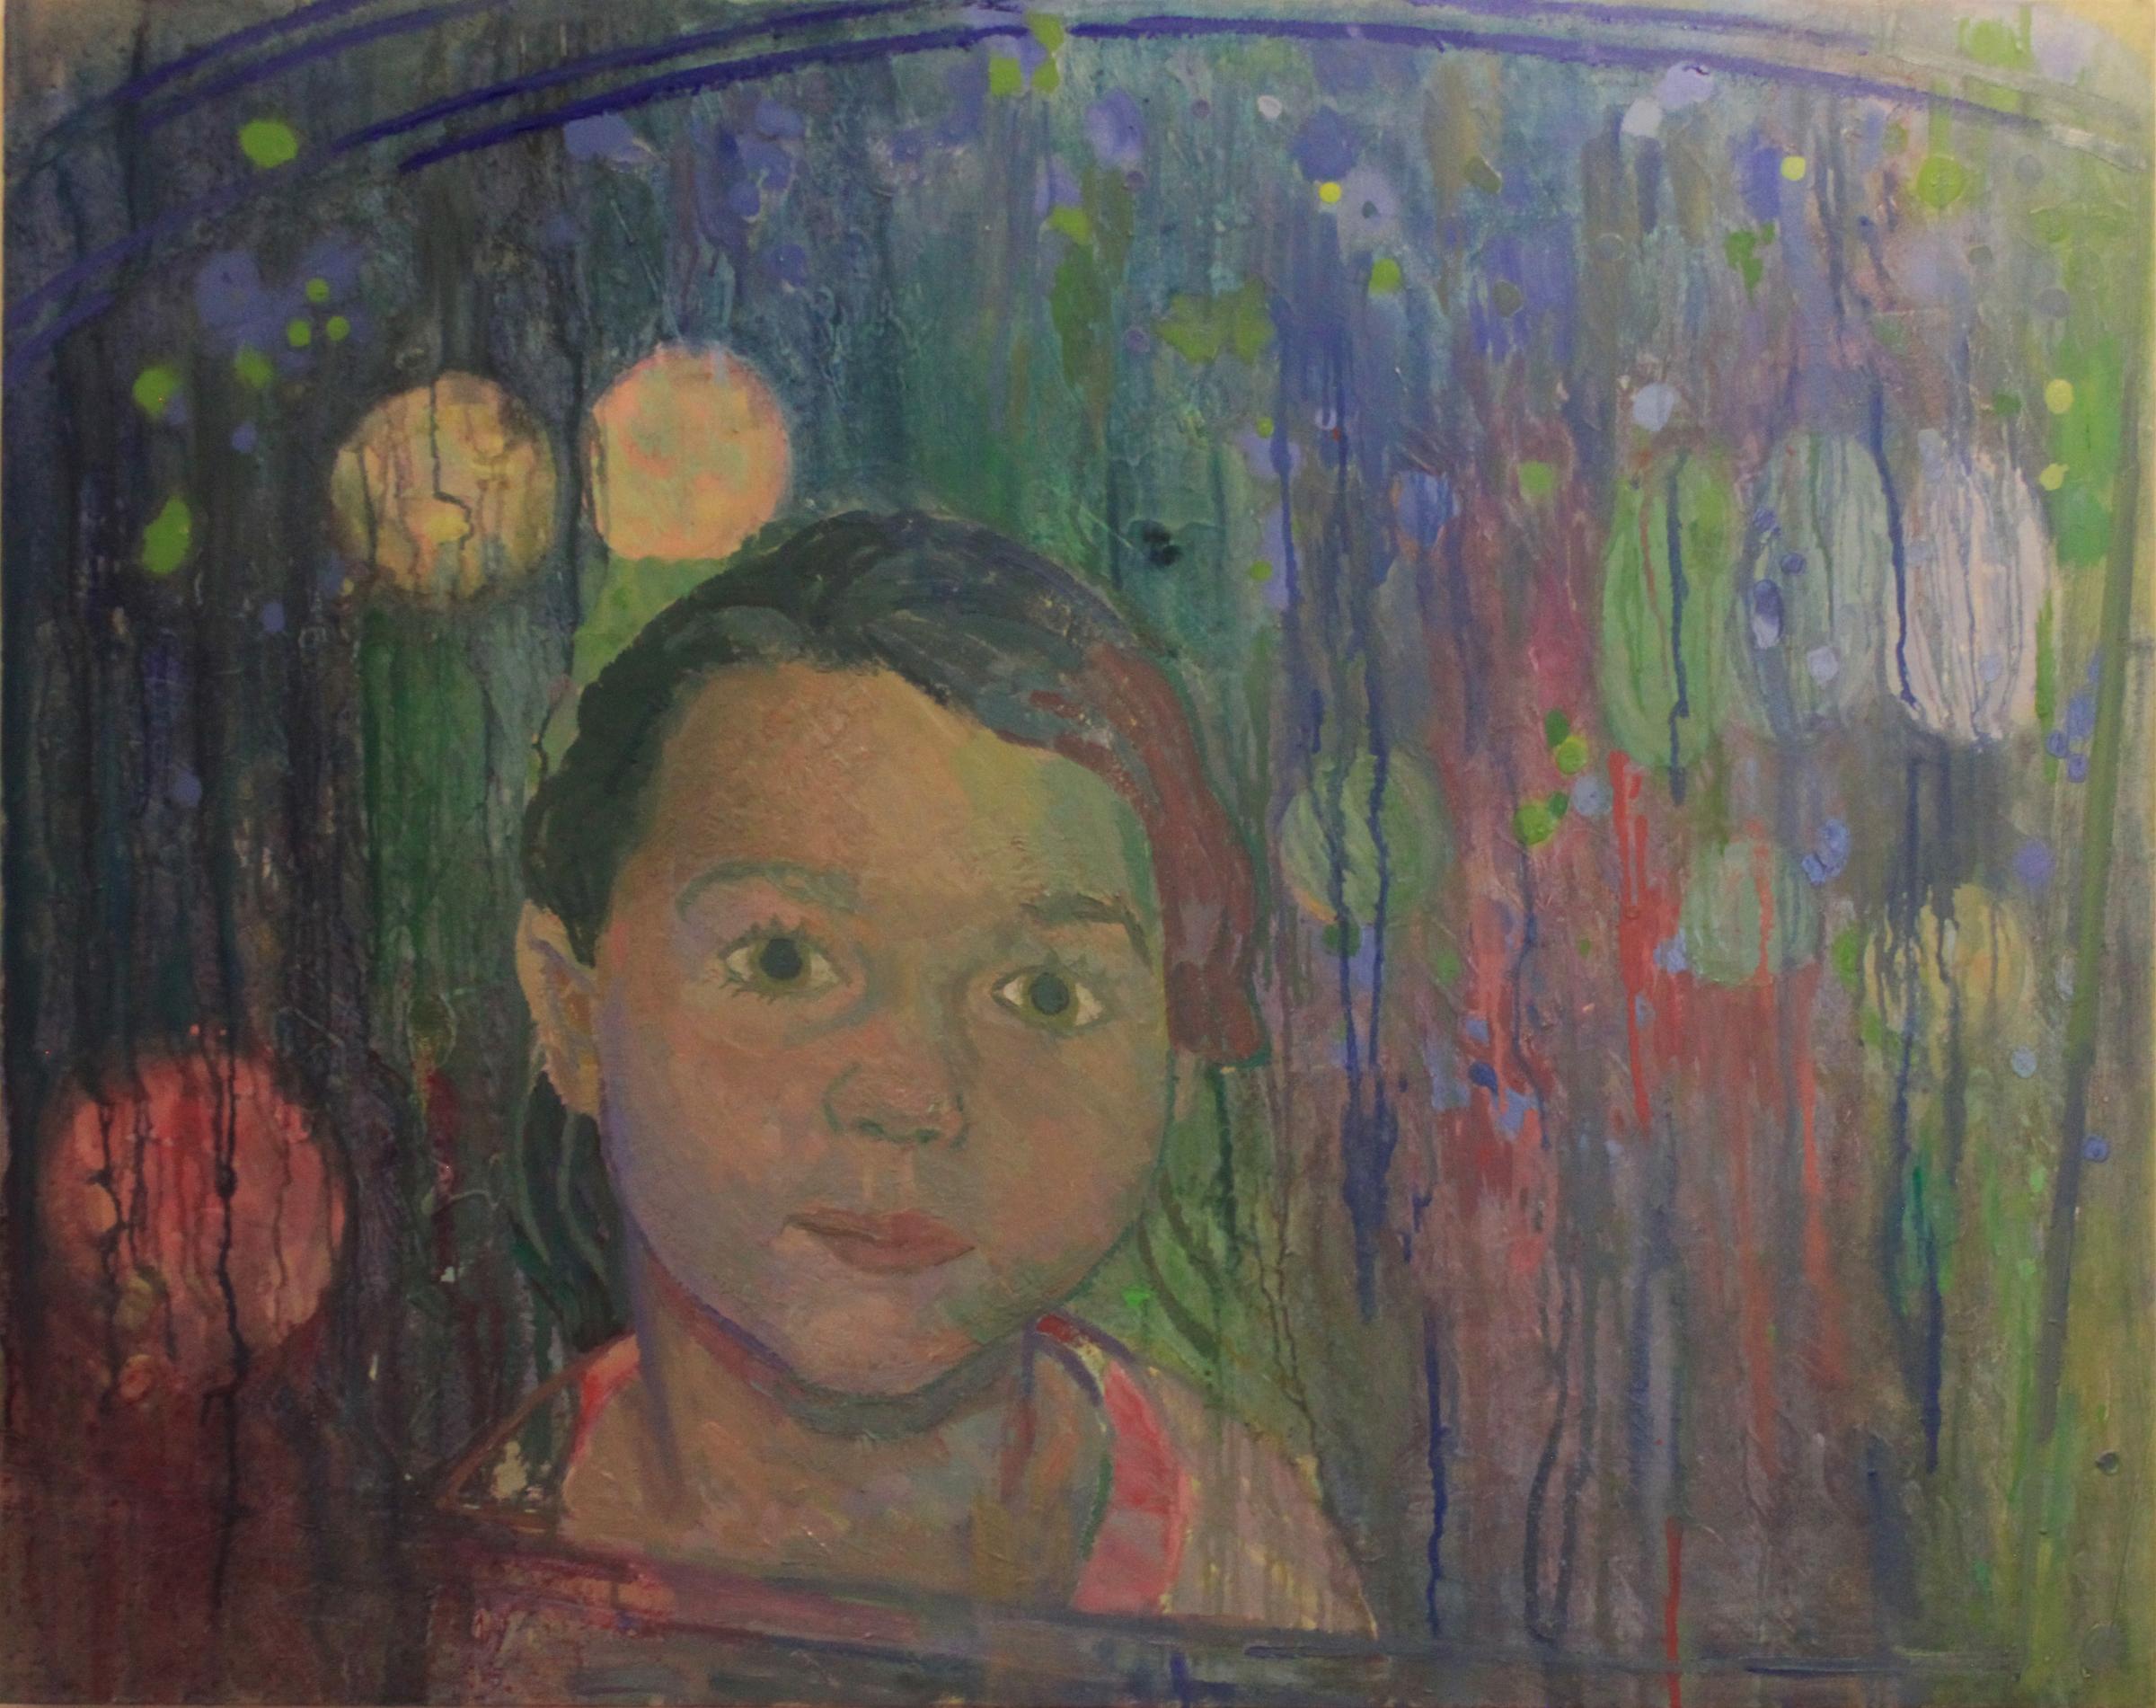 Rain at Night by Jesse Unsworth